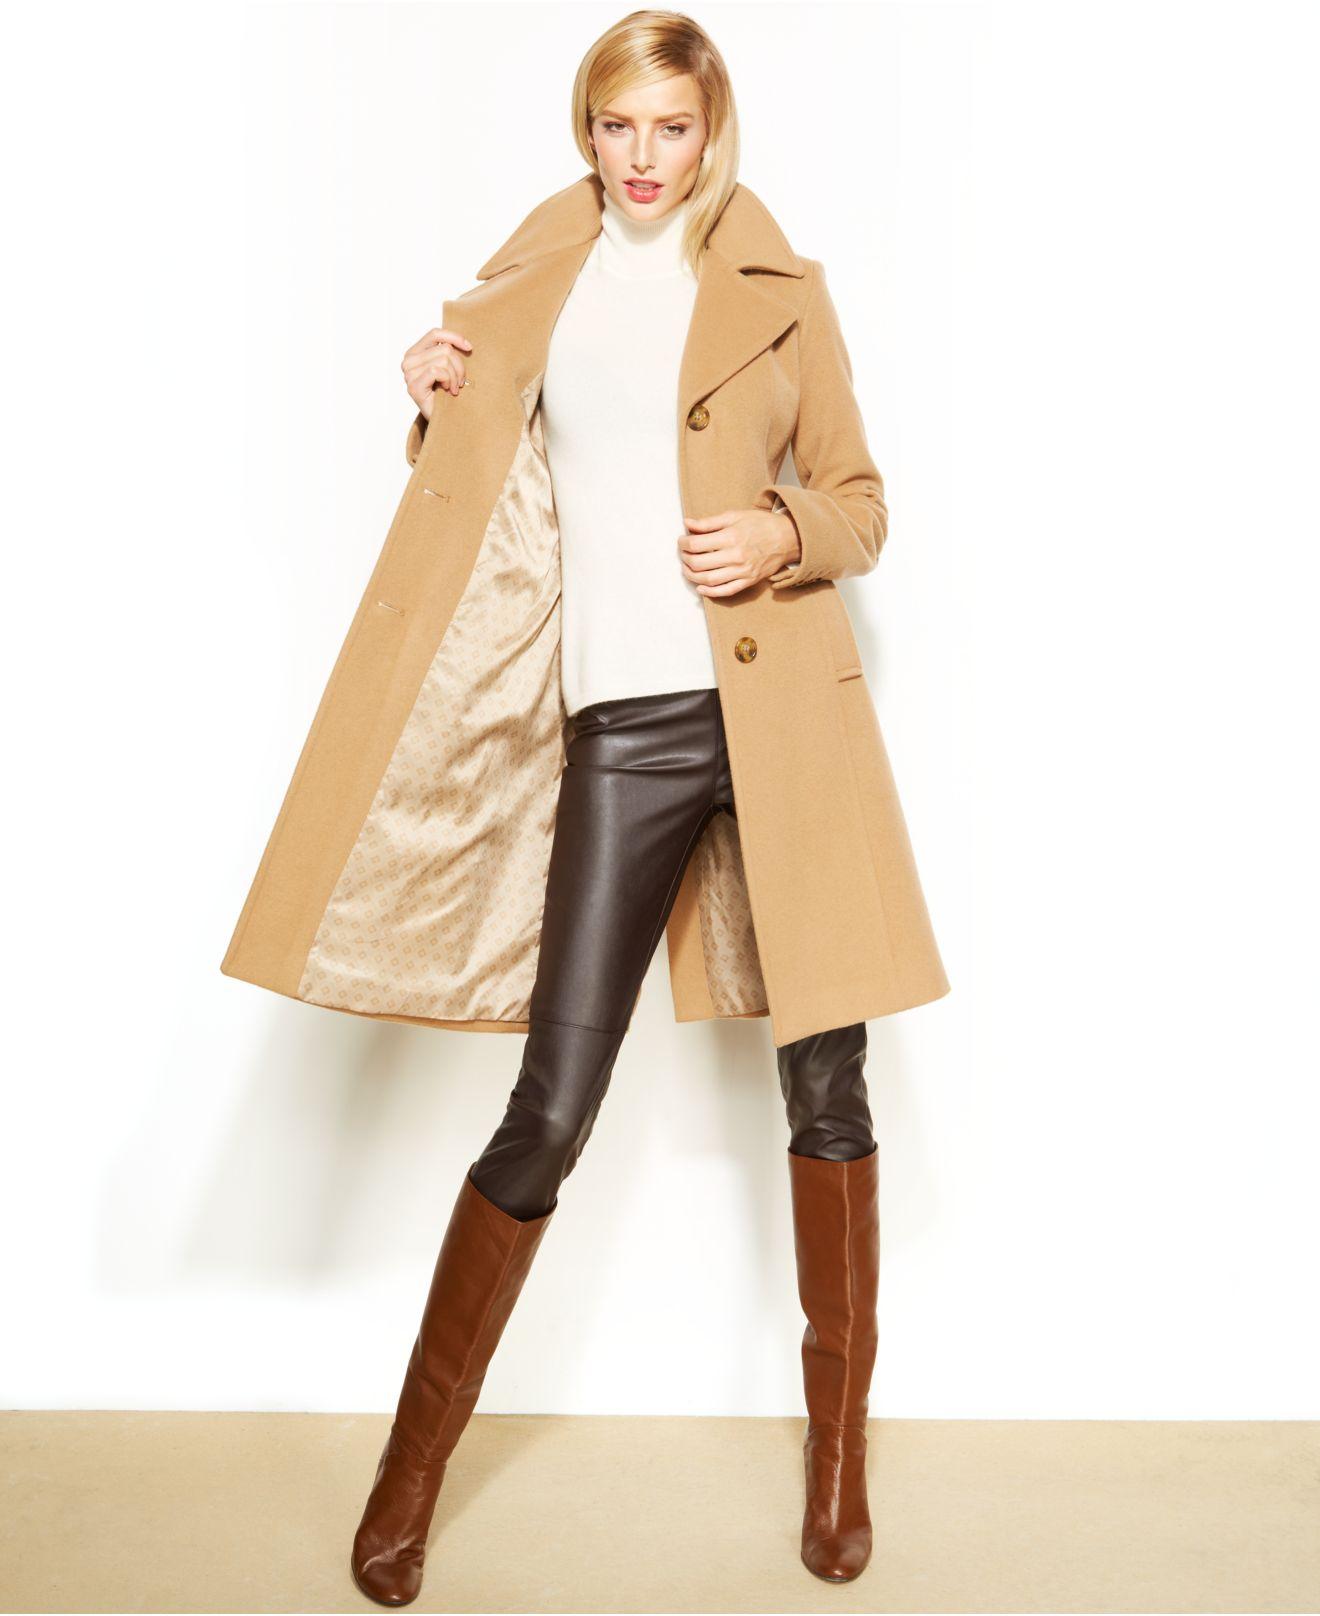 e242ead788eeda Anne Klein Wool-Cashmere-Blend Notched-Collar Walker Coat in Natural ...